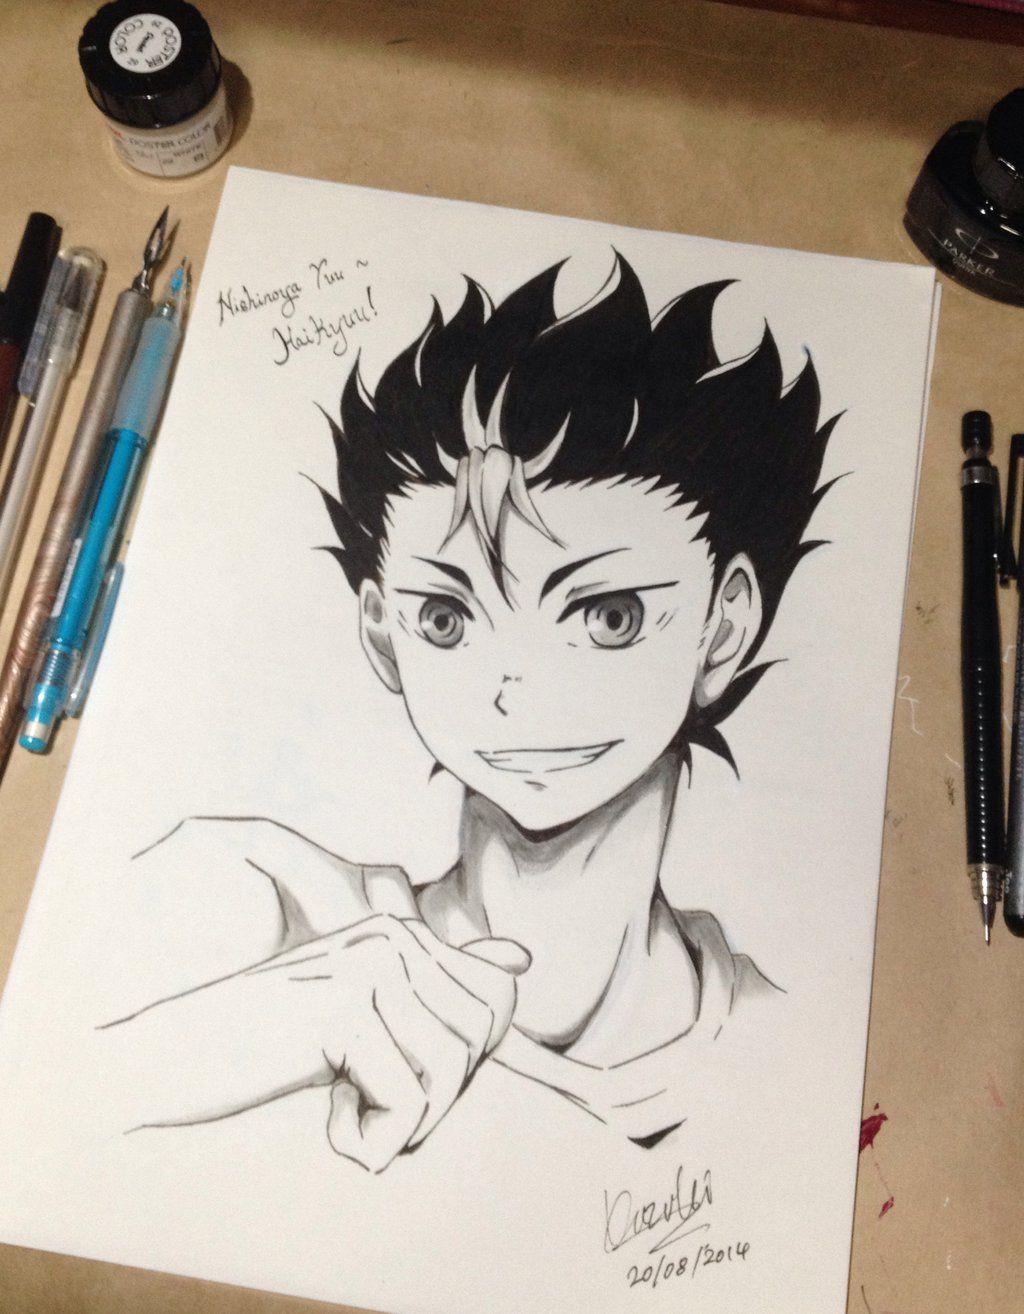 Haikyuu Nishinoya Yuu Fan Art Haikyuu Anime Anime Sketch Anime Boy Sketch